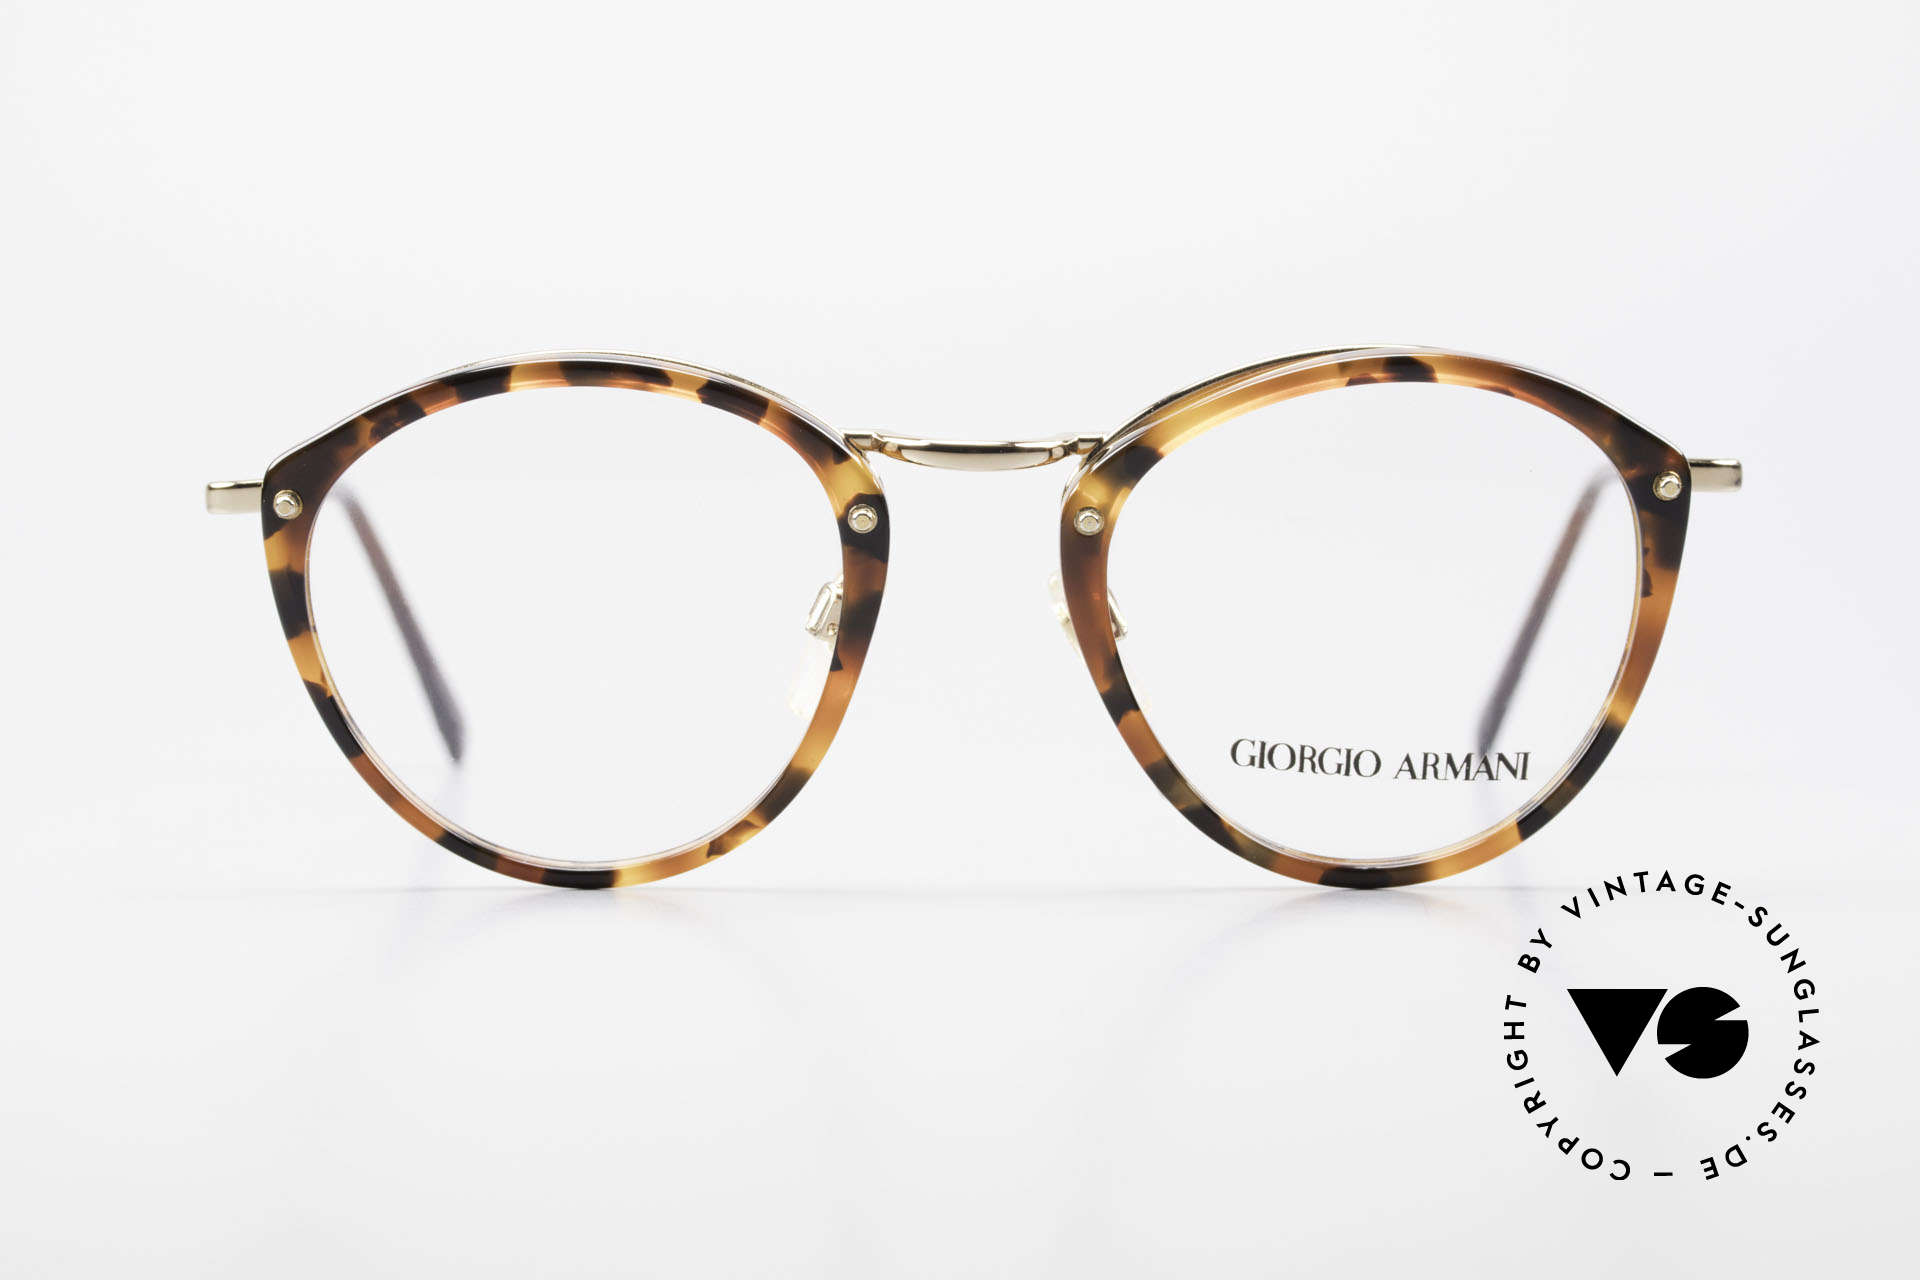 Giorgio Armani 354 No Retro Glasses 80's Frame, timeless elegant combination of colors and materials, Made for Men and Women